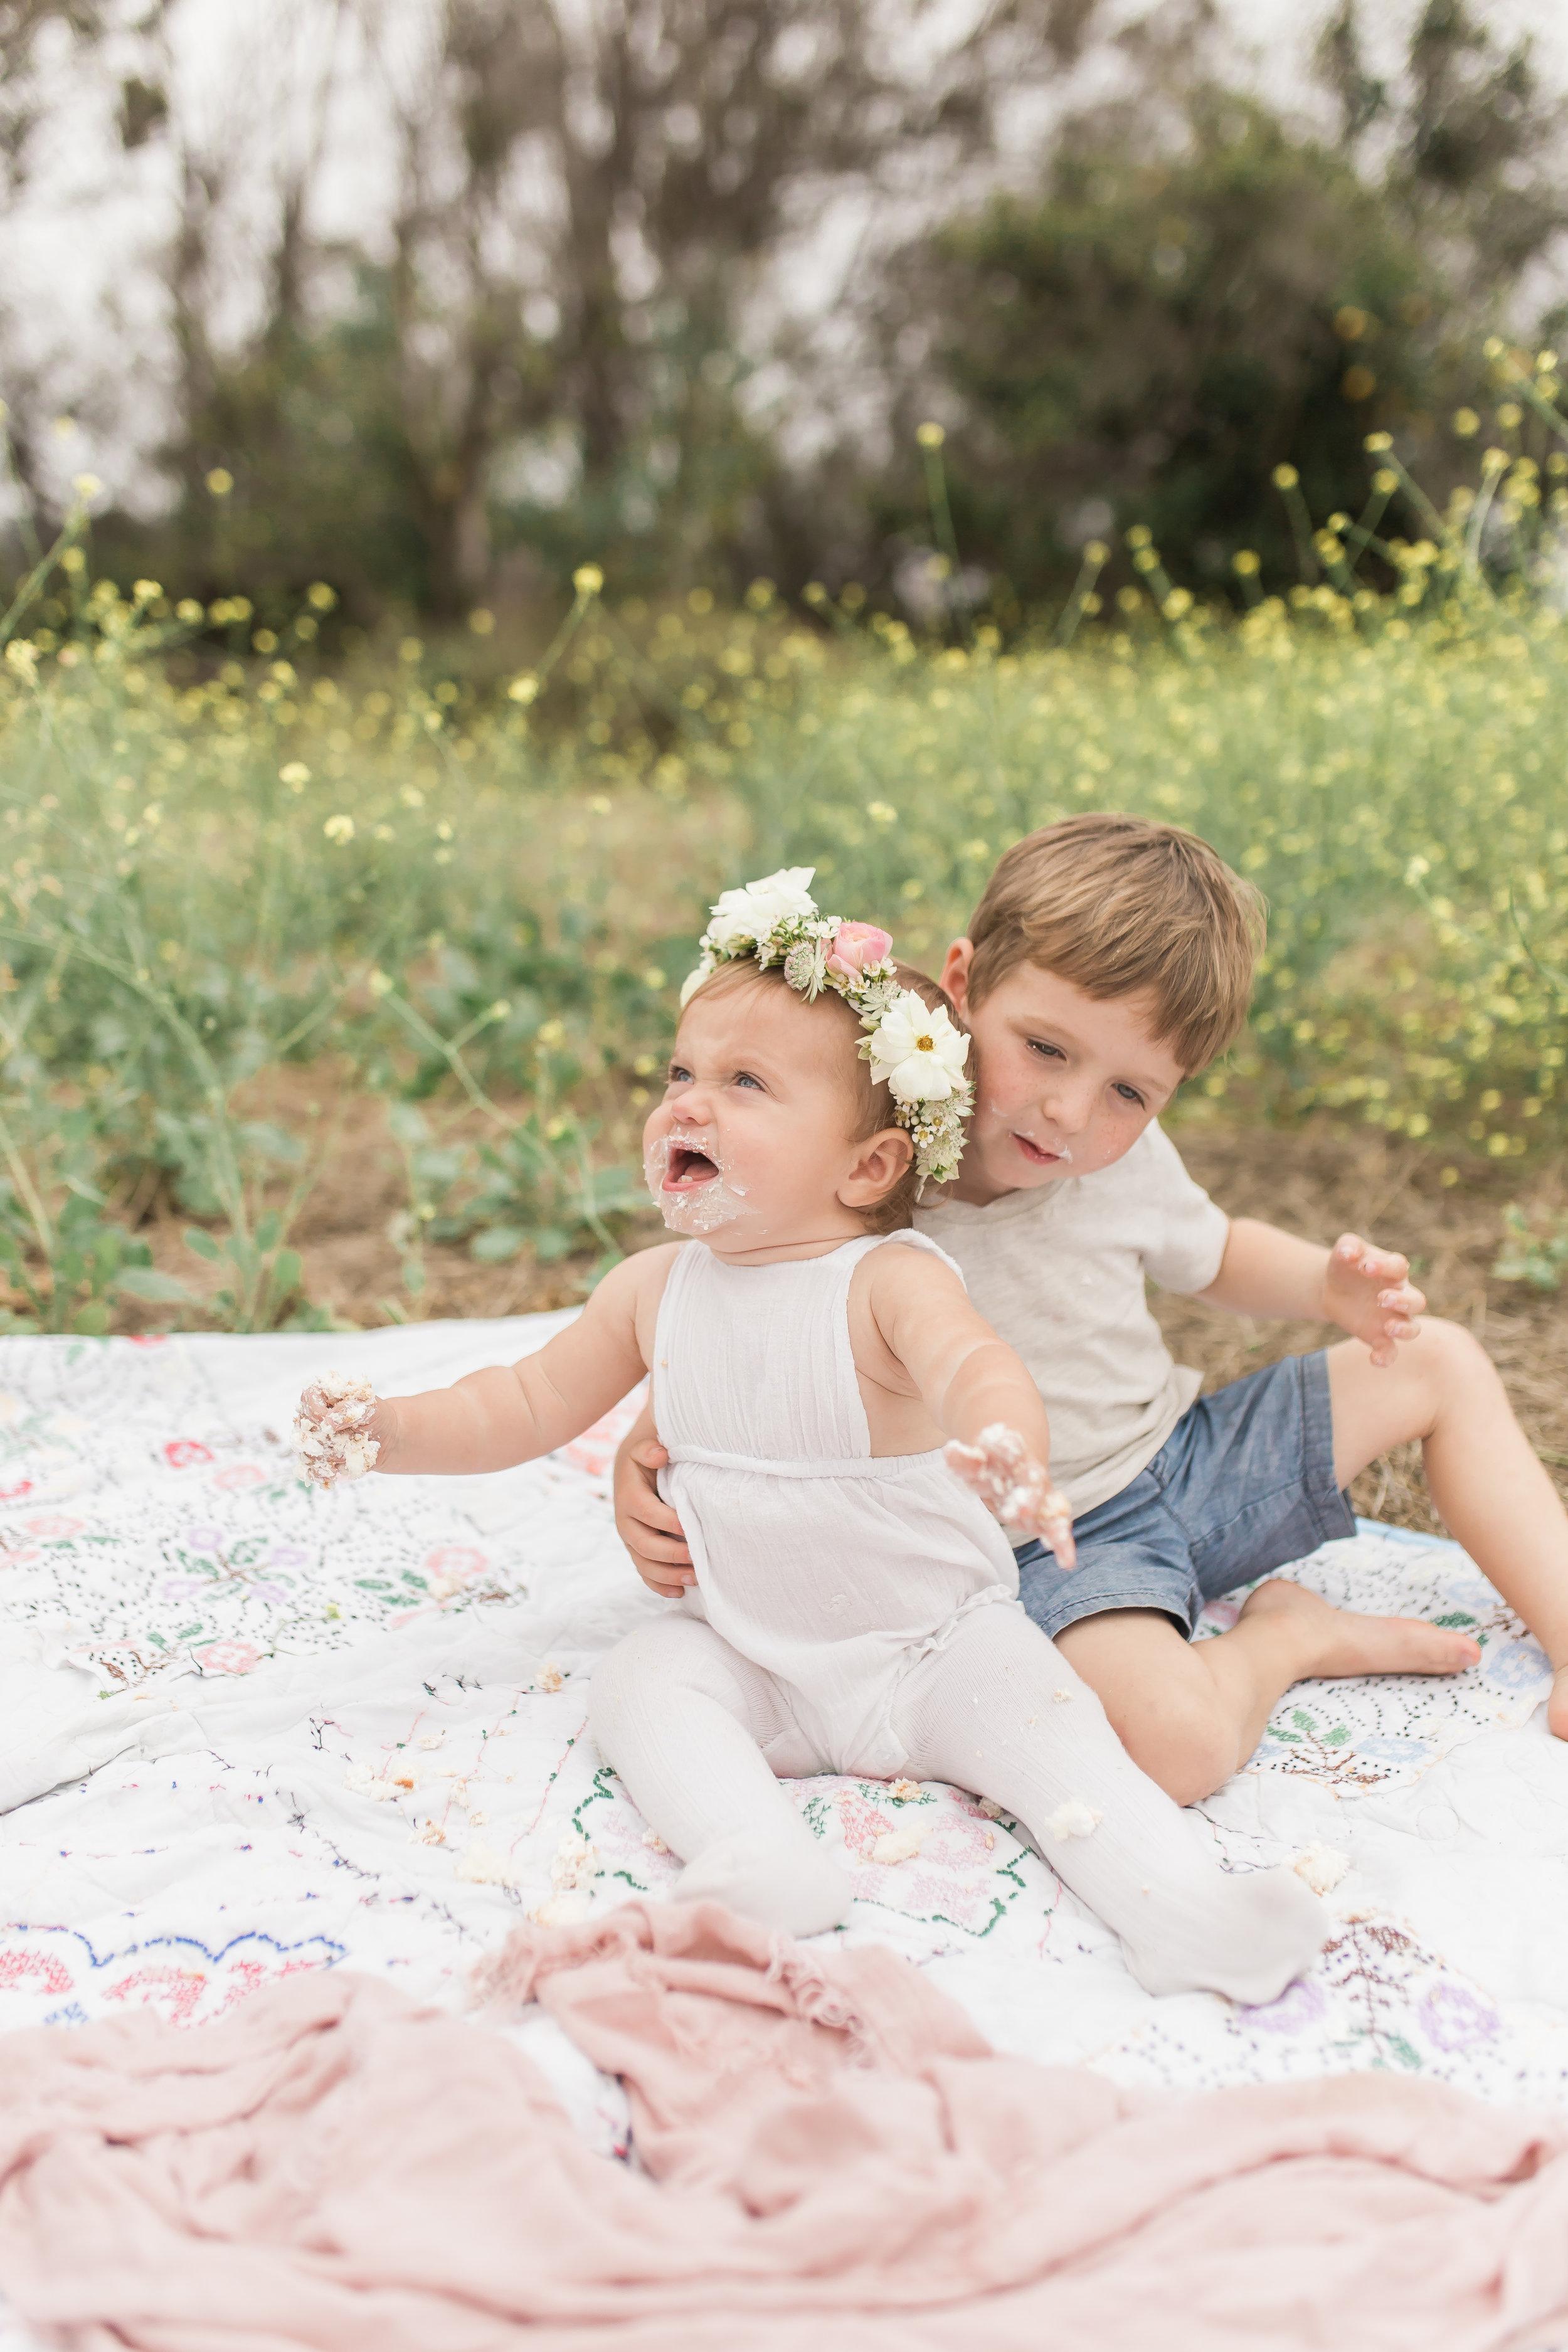 Dana Point Infant Photographer 1st birthday